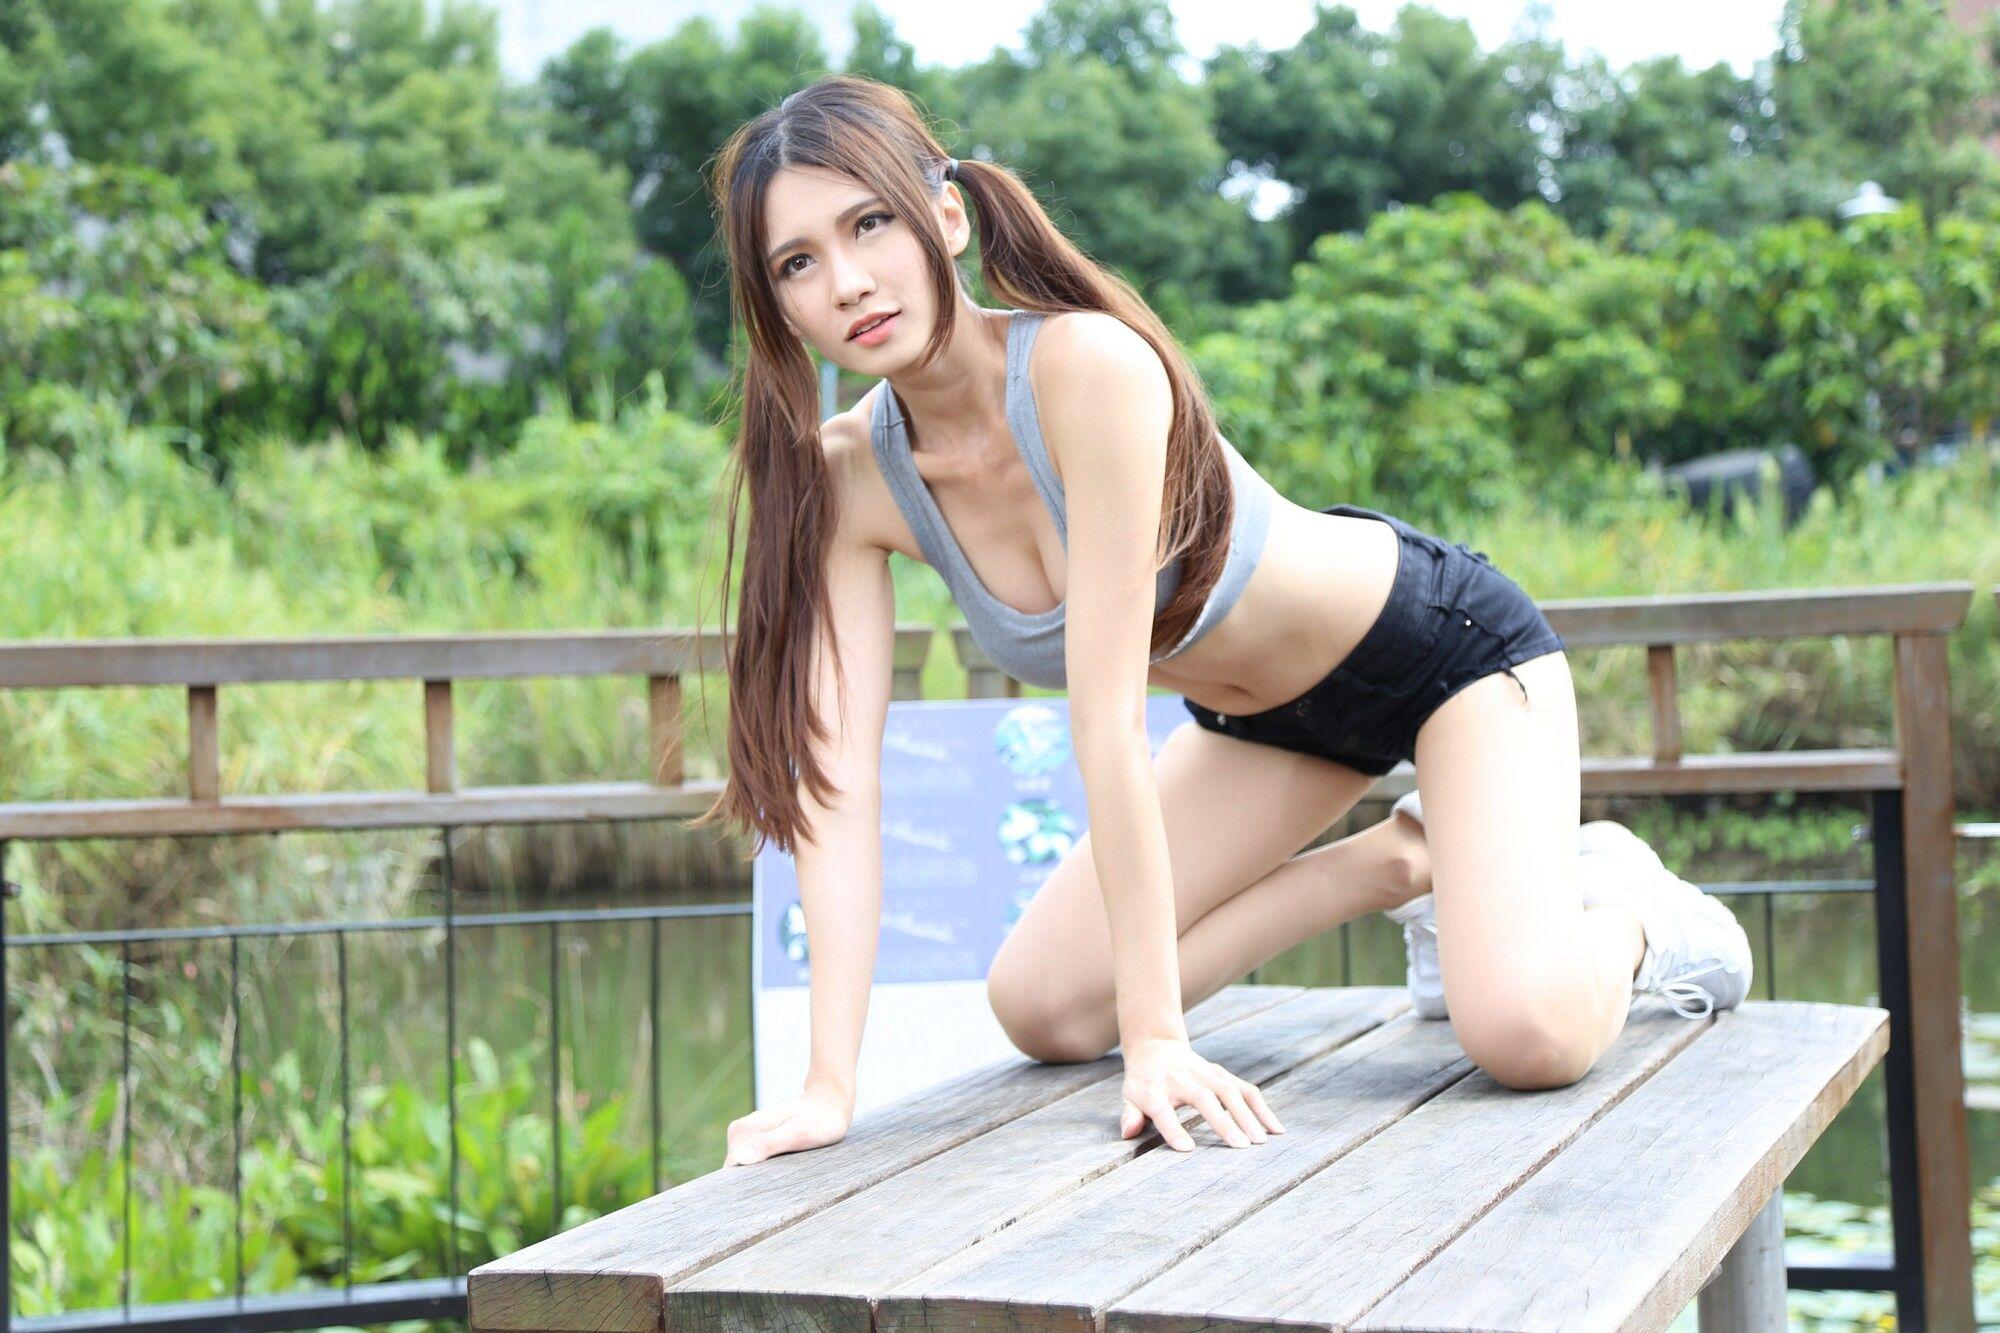 VOL.917 [台湾正妹]热裤运动装清新:蔡译心(Candice)超高清个人性感漂亮大图(98P)